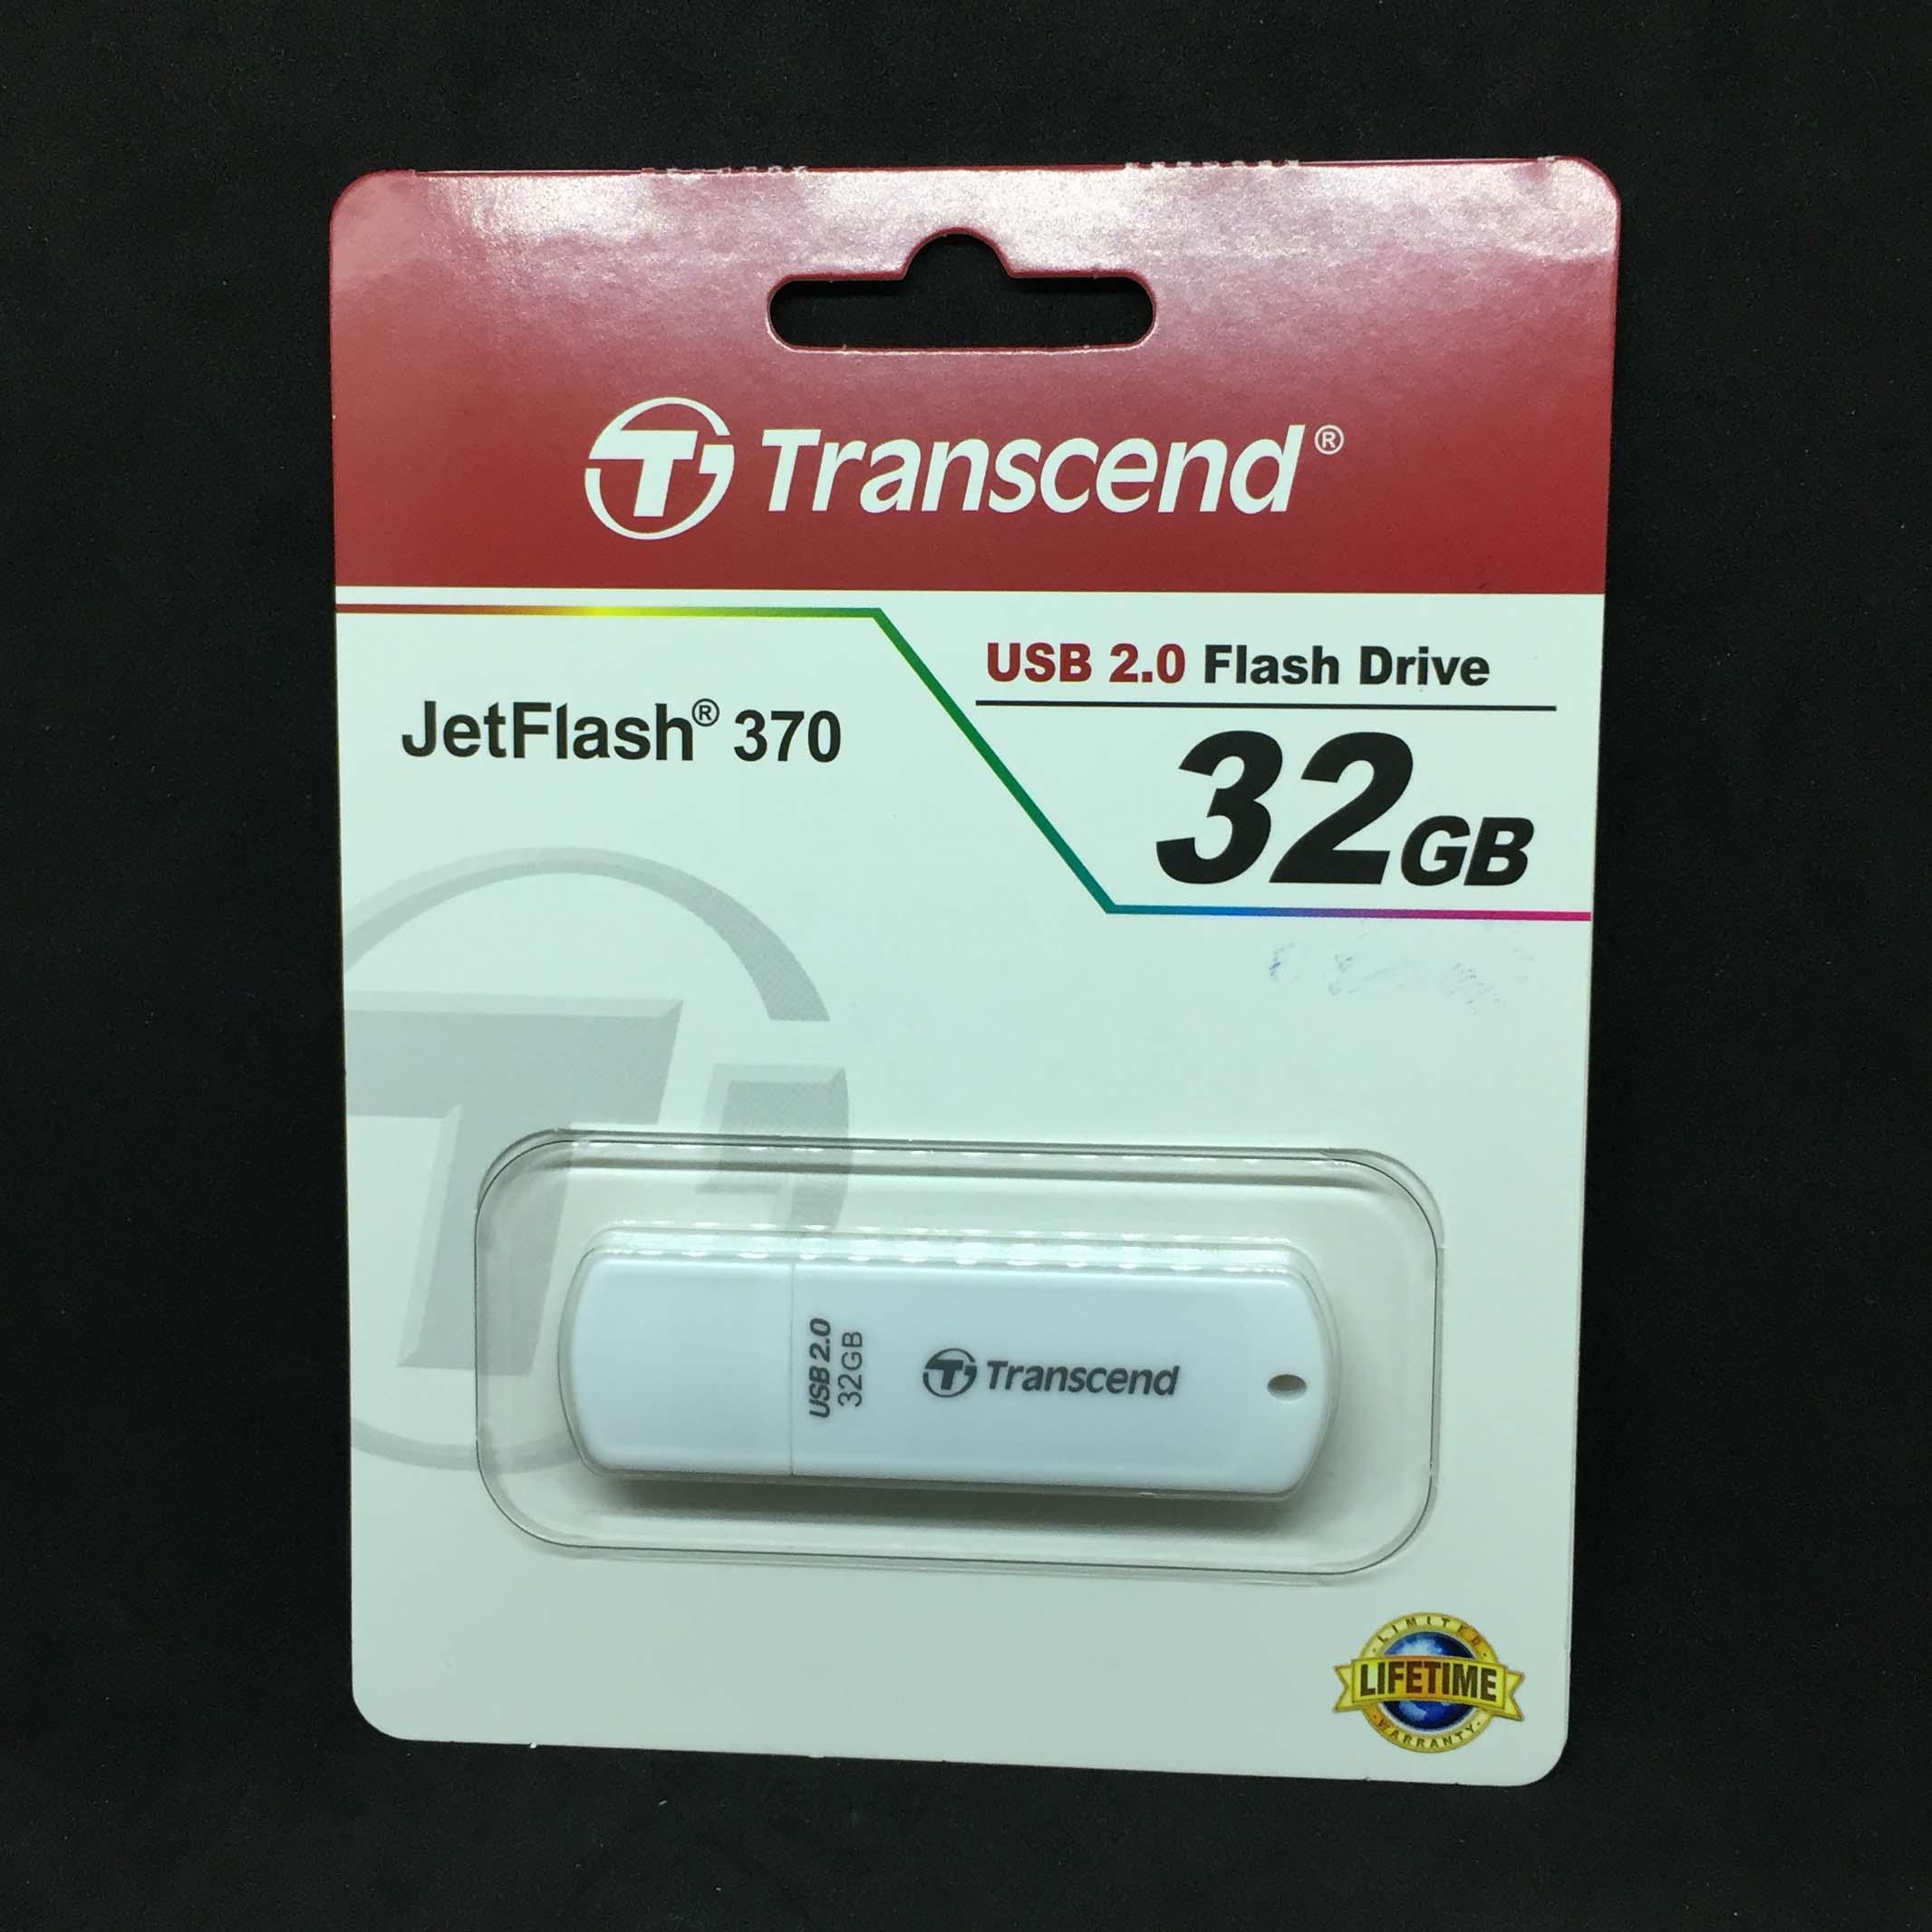 Sandisk cruzer facet 16gb usb flash drive (red)